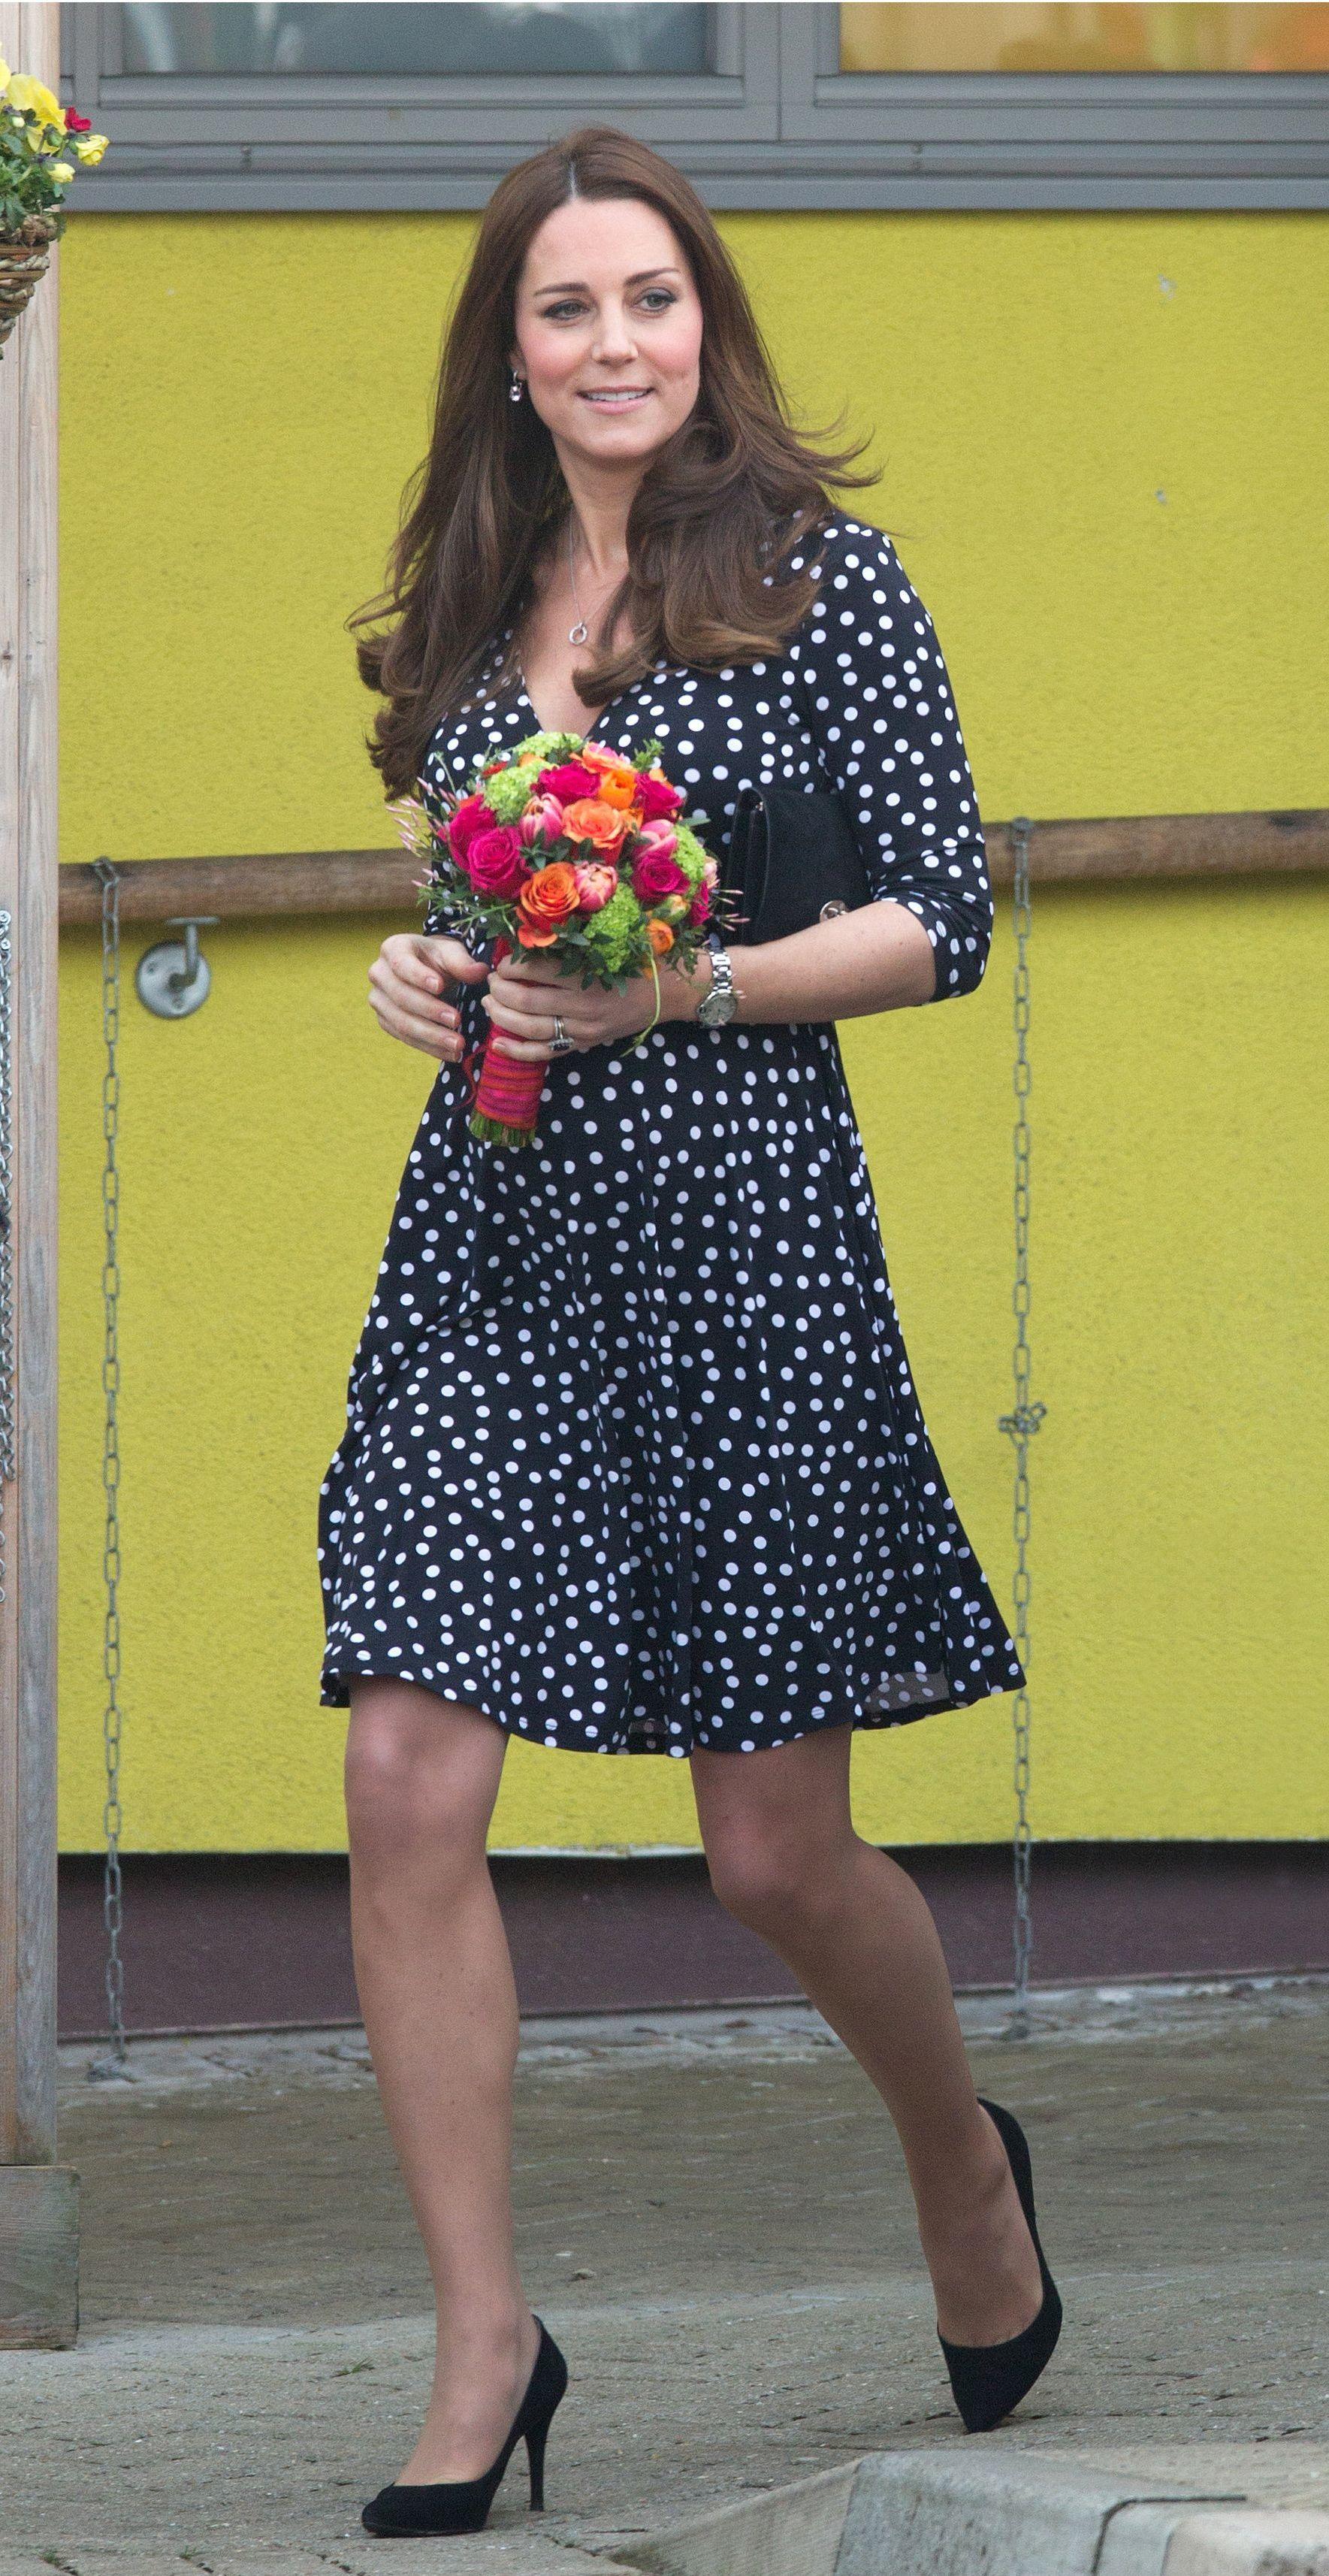 Kate Middleton Thrifty Looks Wonderwatch